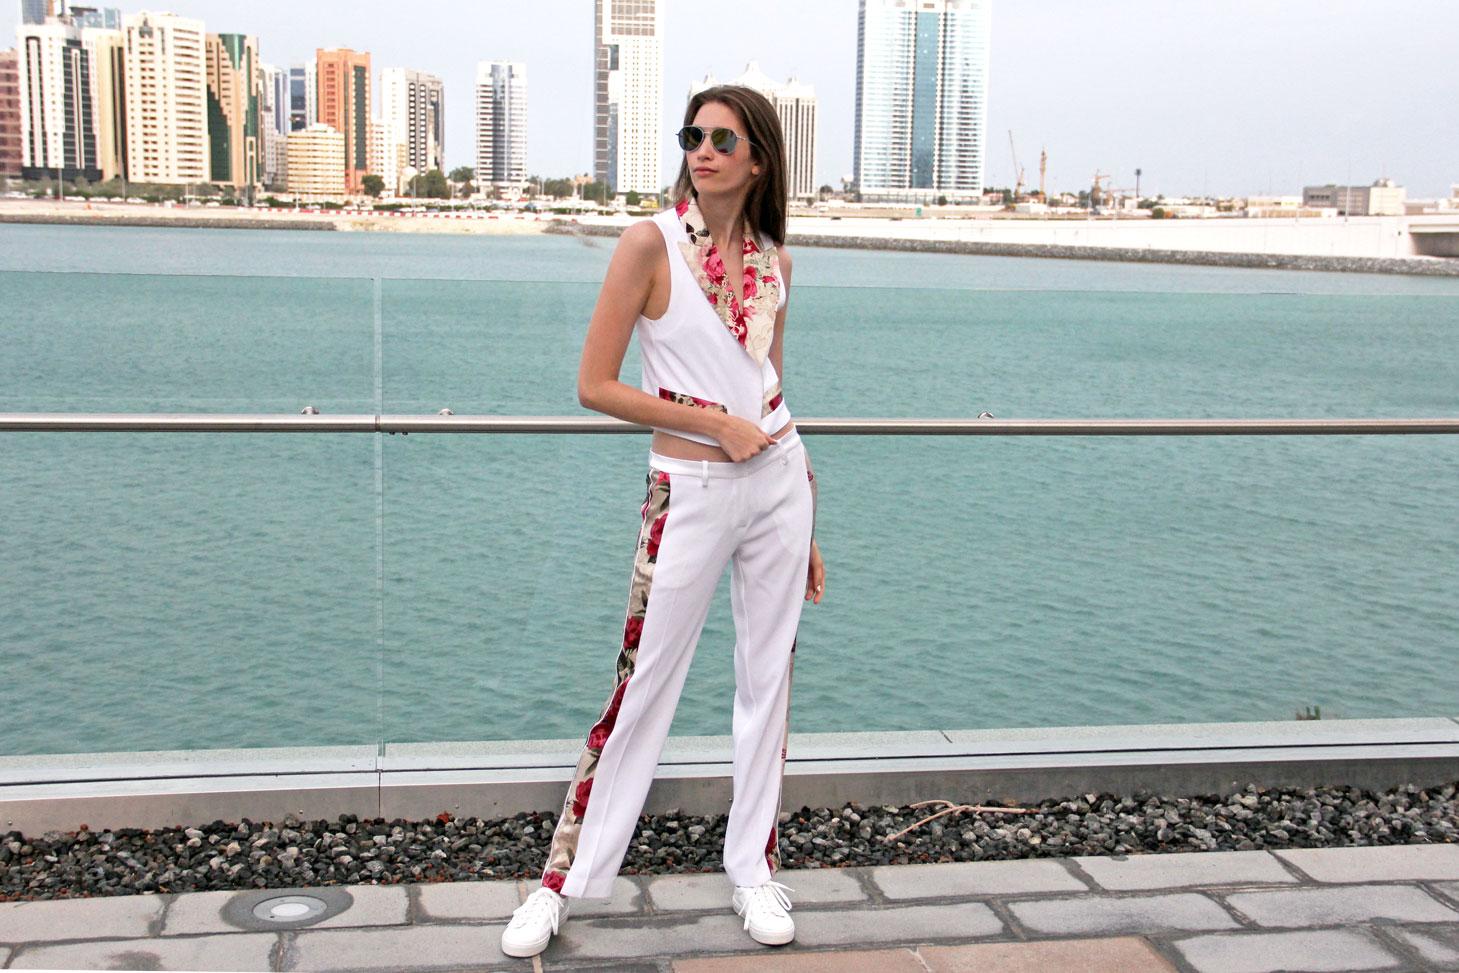 Adriana Iglesias SS16 White Floral Outfit